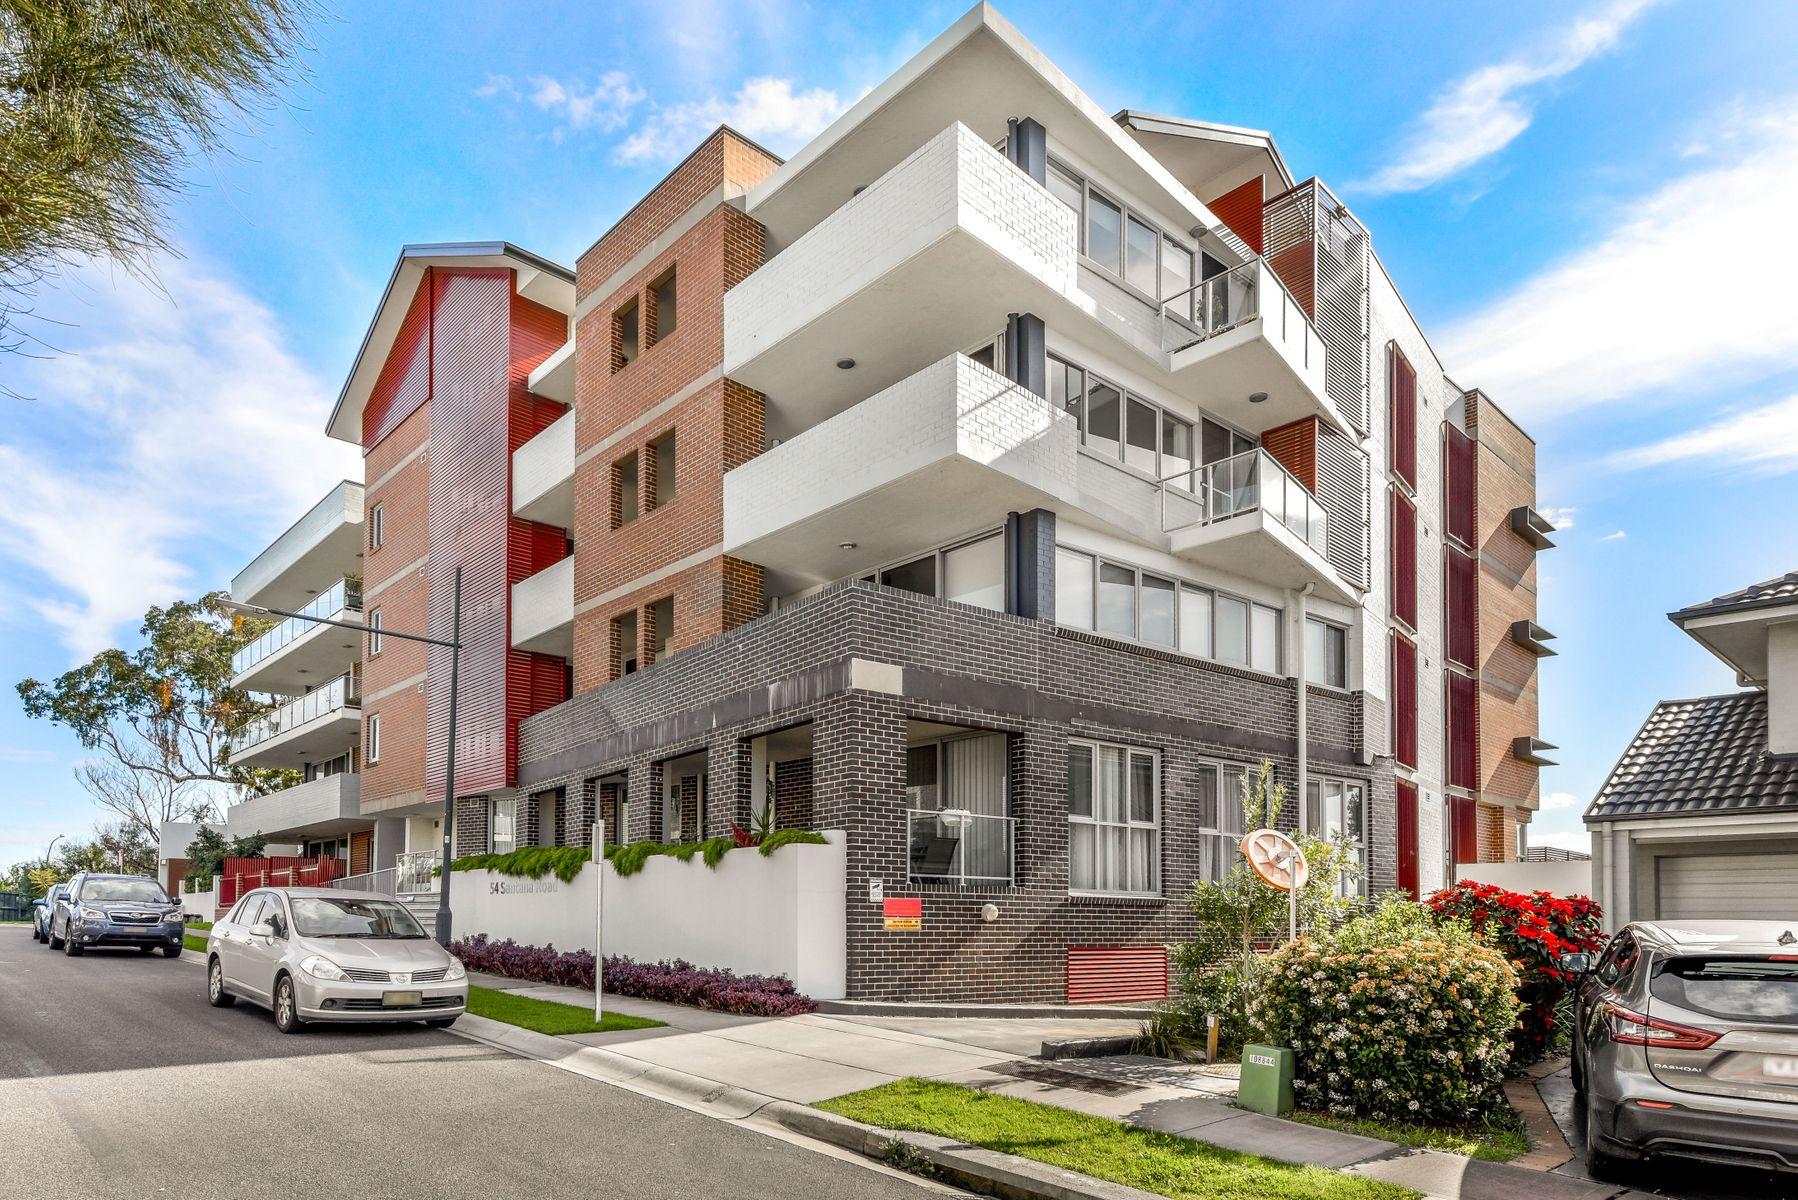 18/54 Santana Road, Campbelltown, NSW 2560